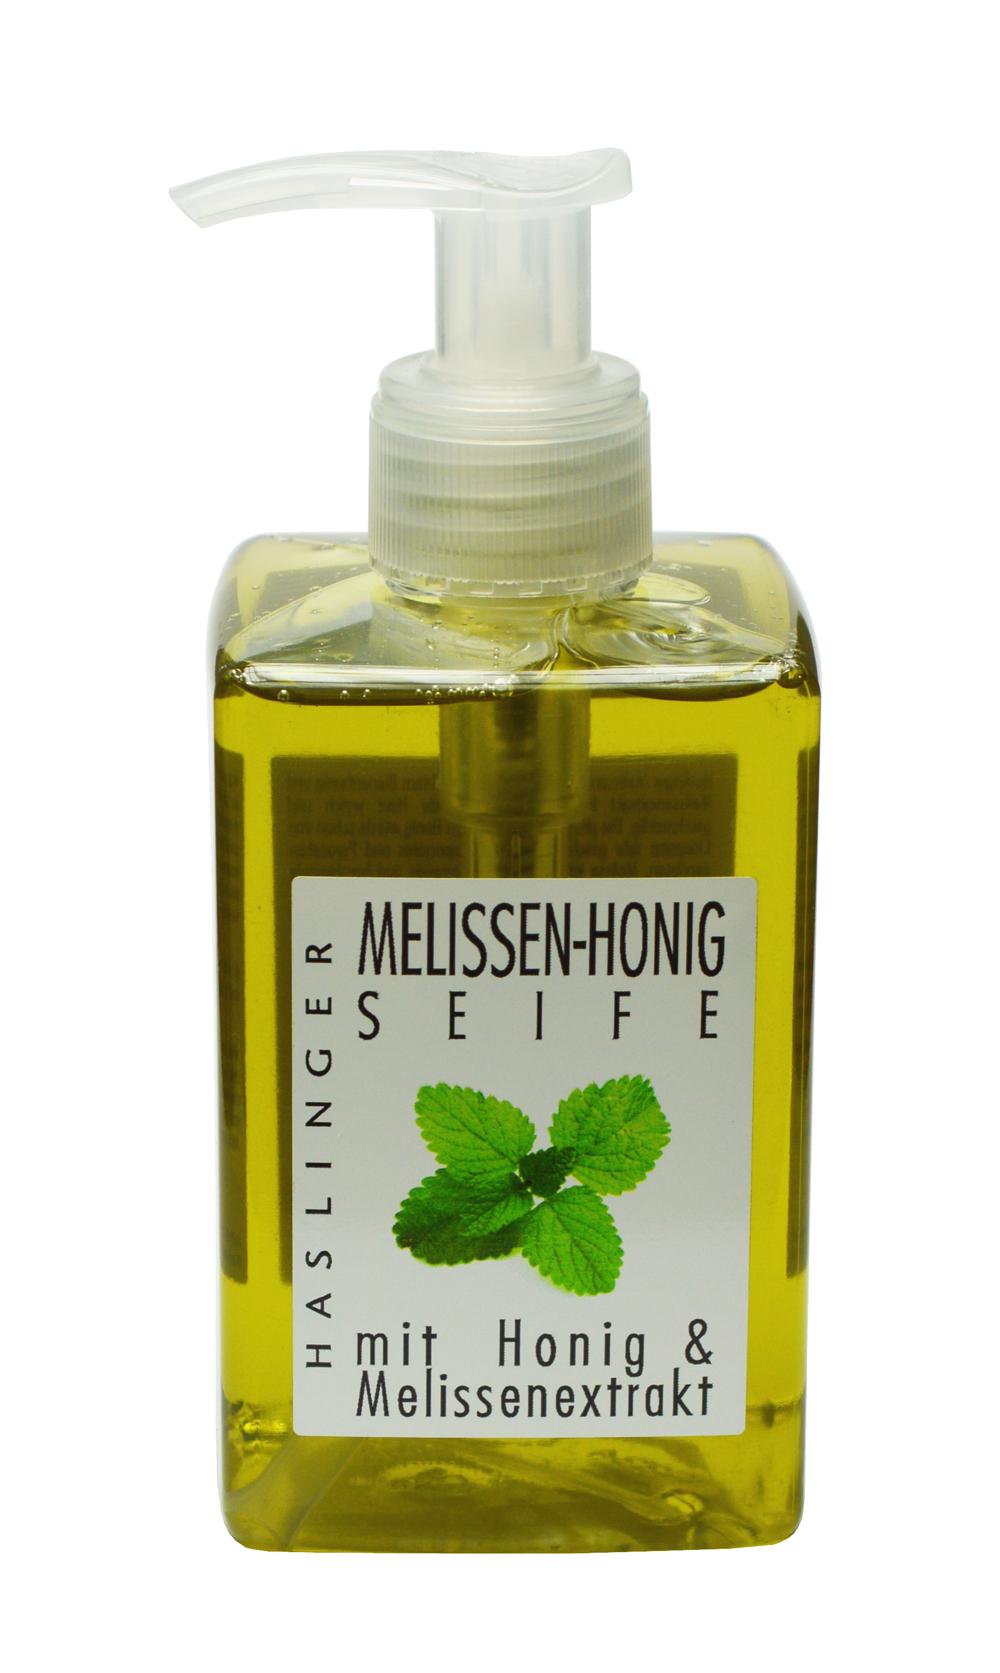 Haslinger Melissen-Honig Flüssigseife